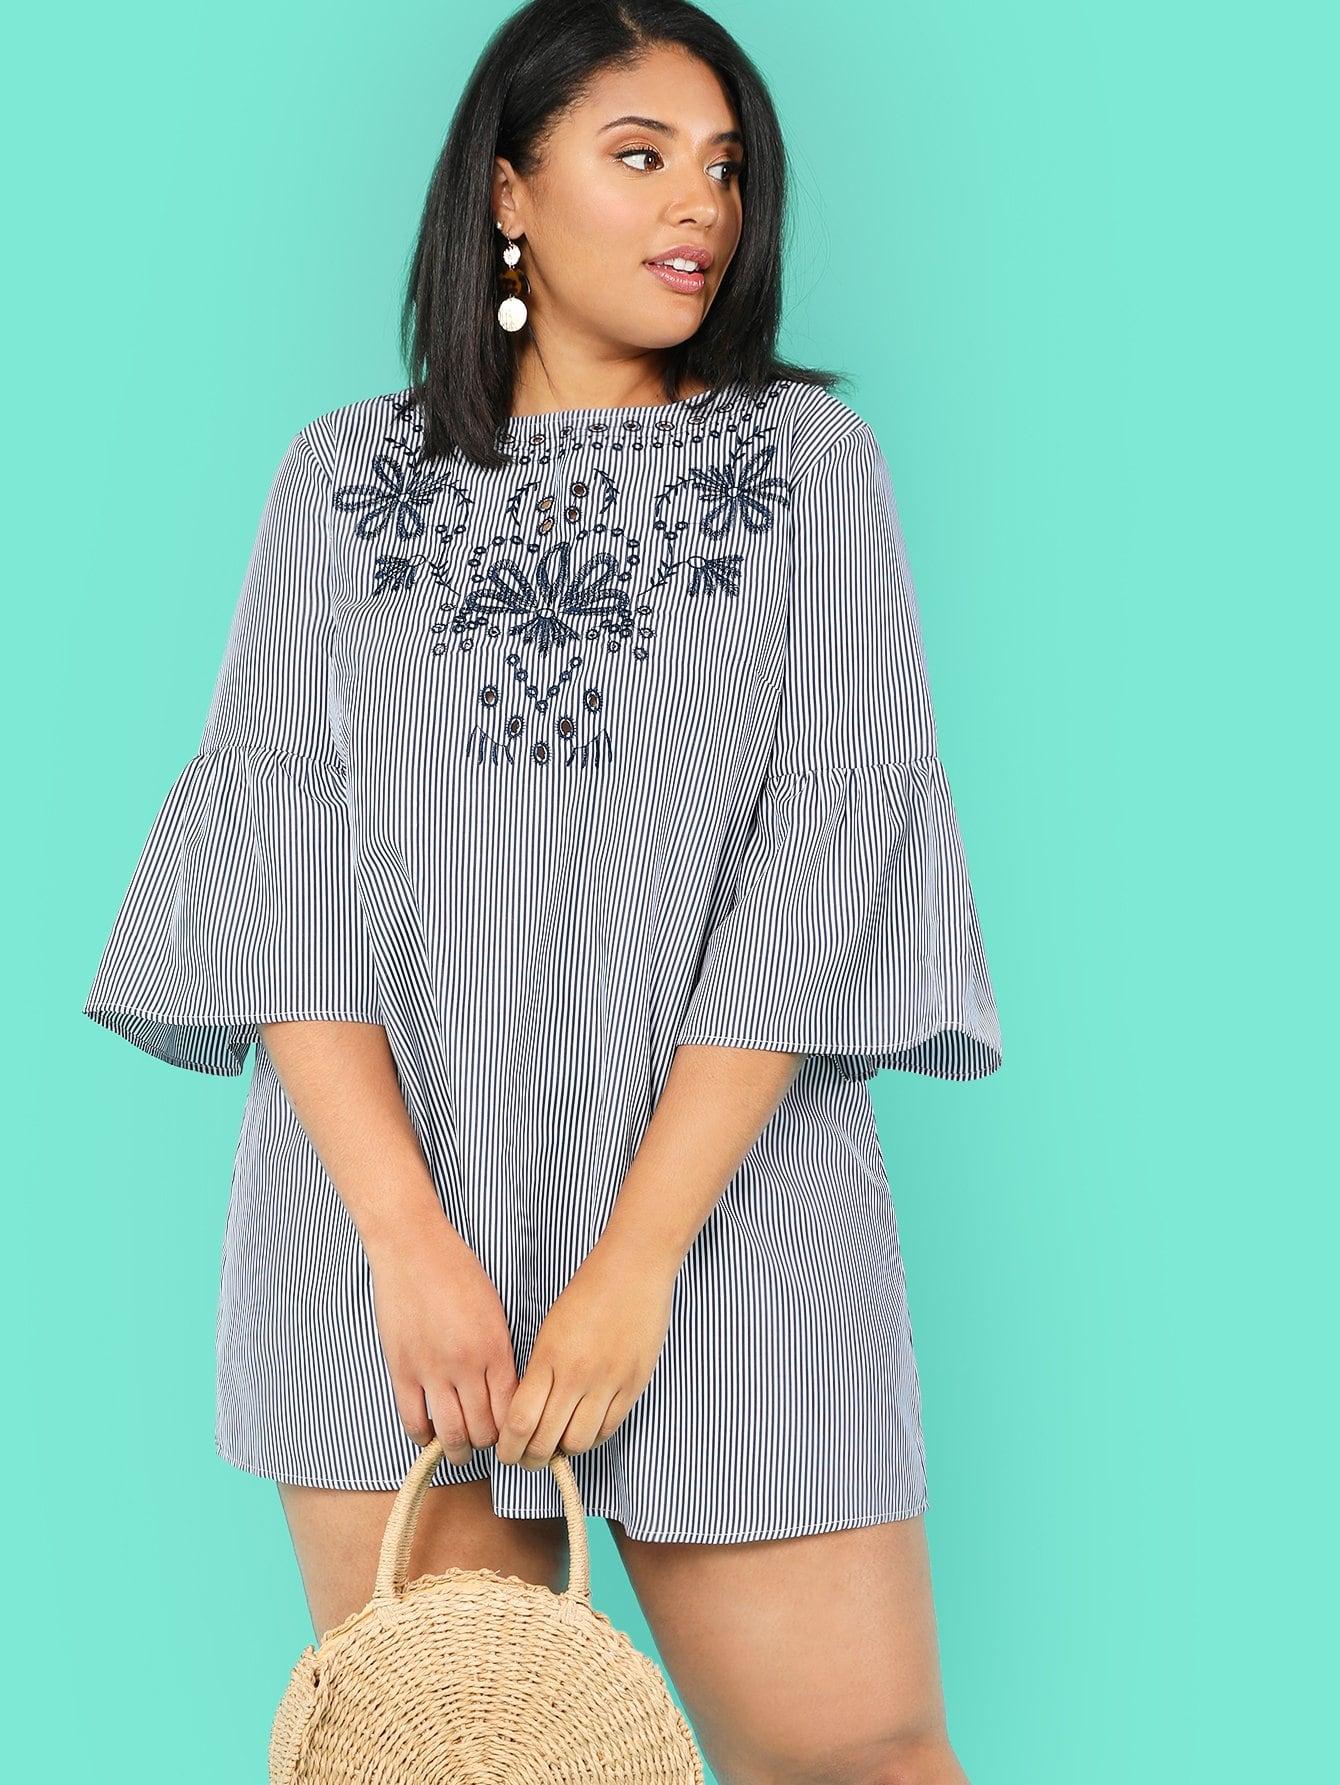 Flounce Sleeve Embroidery Pinstripe Dress flounce sleeve eyelet embroidery dress